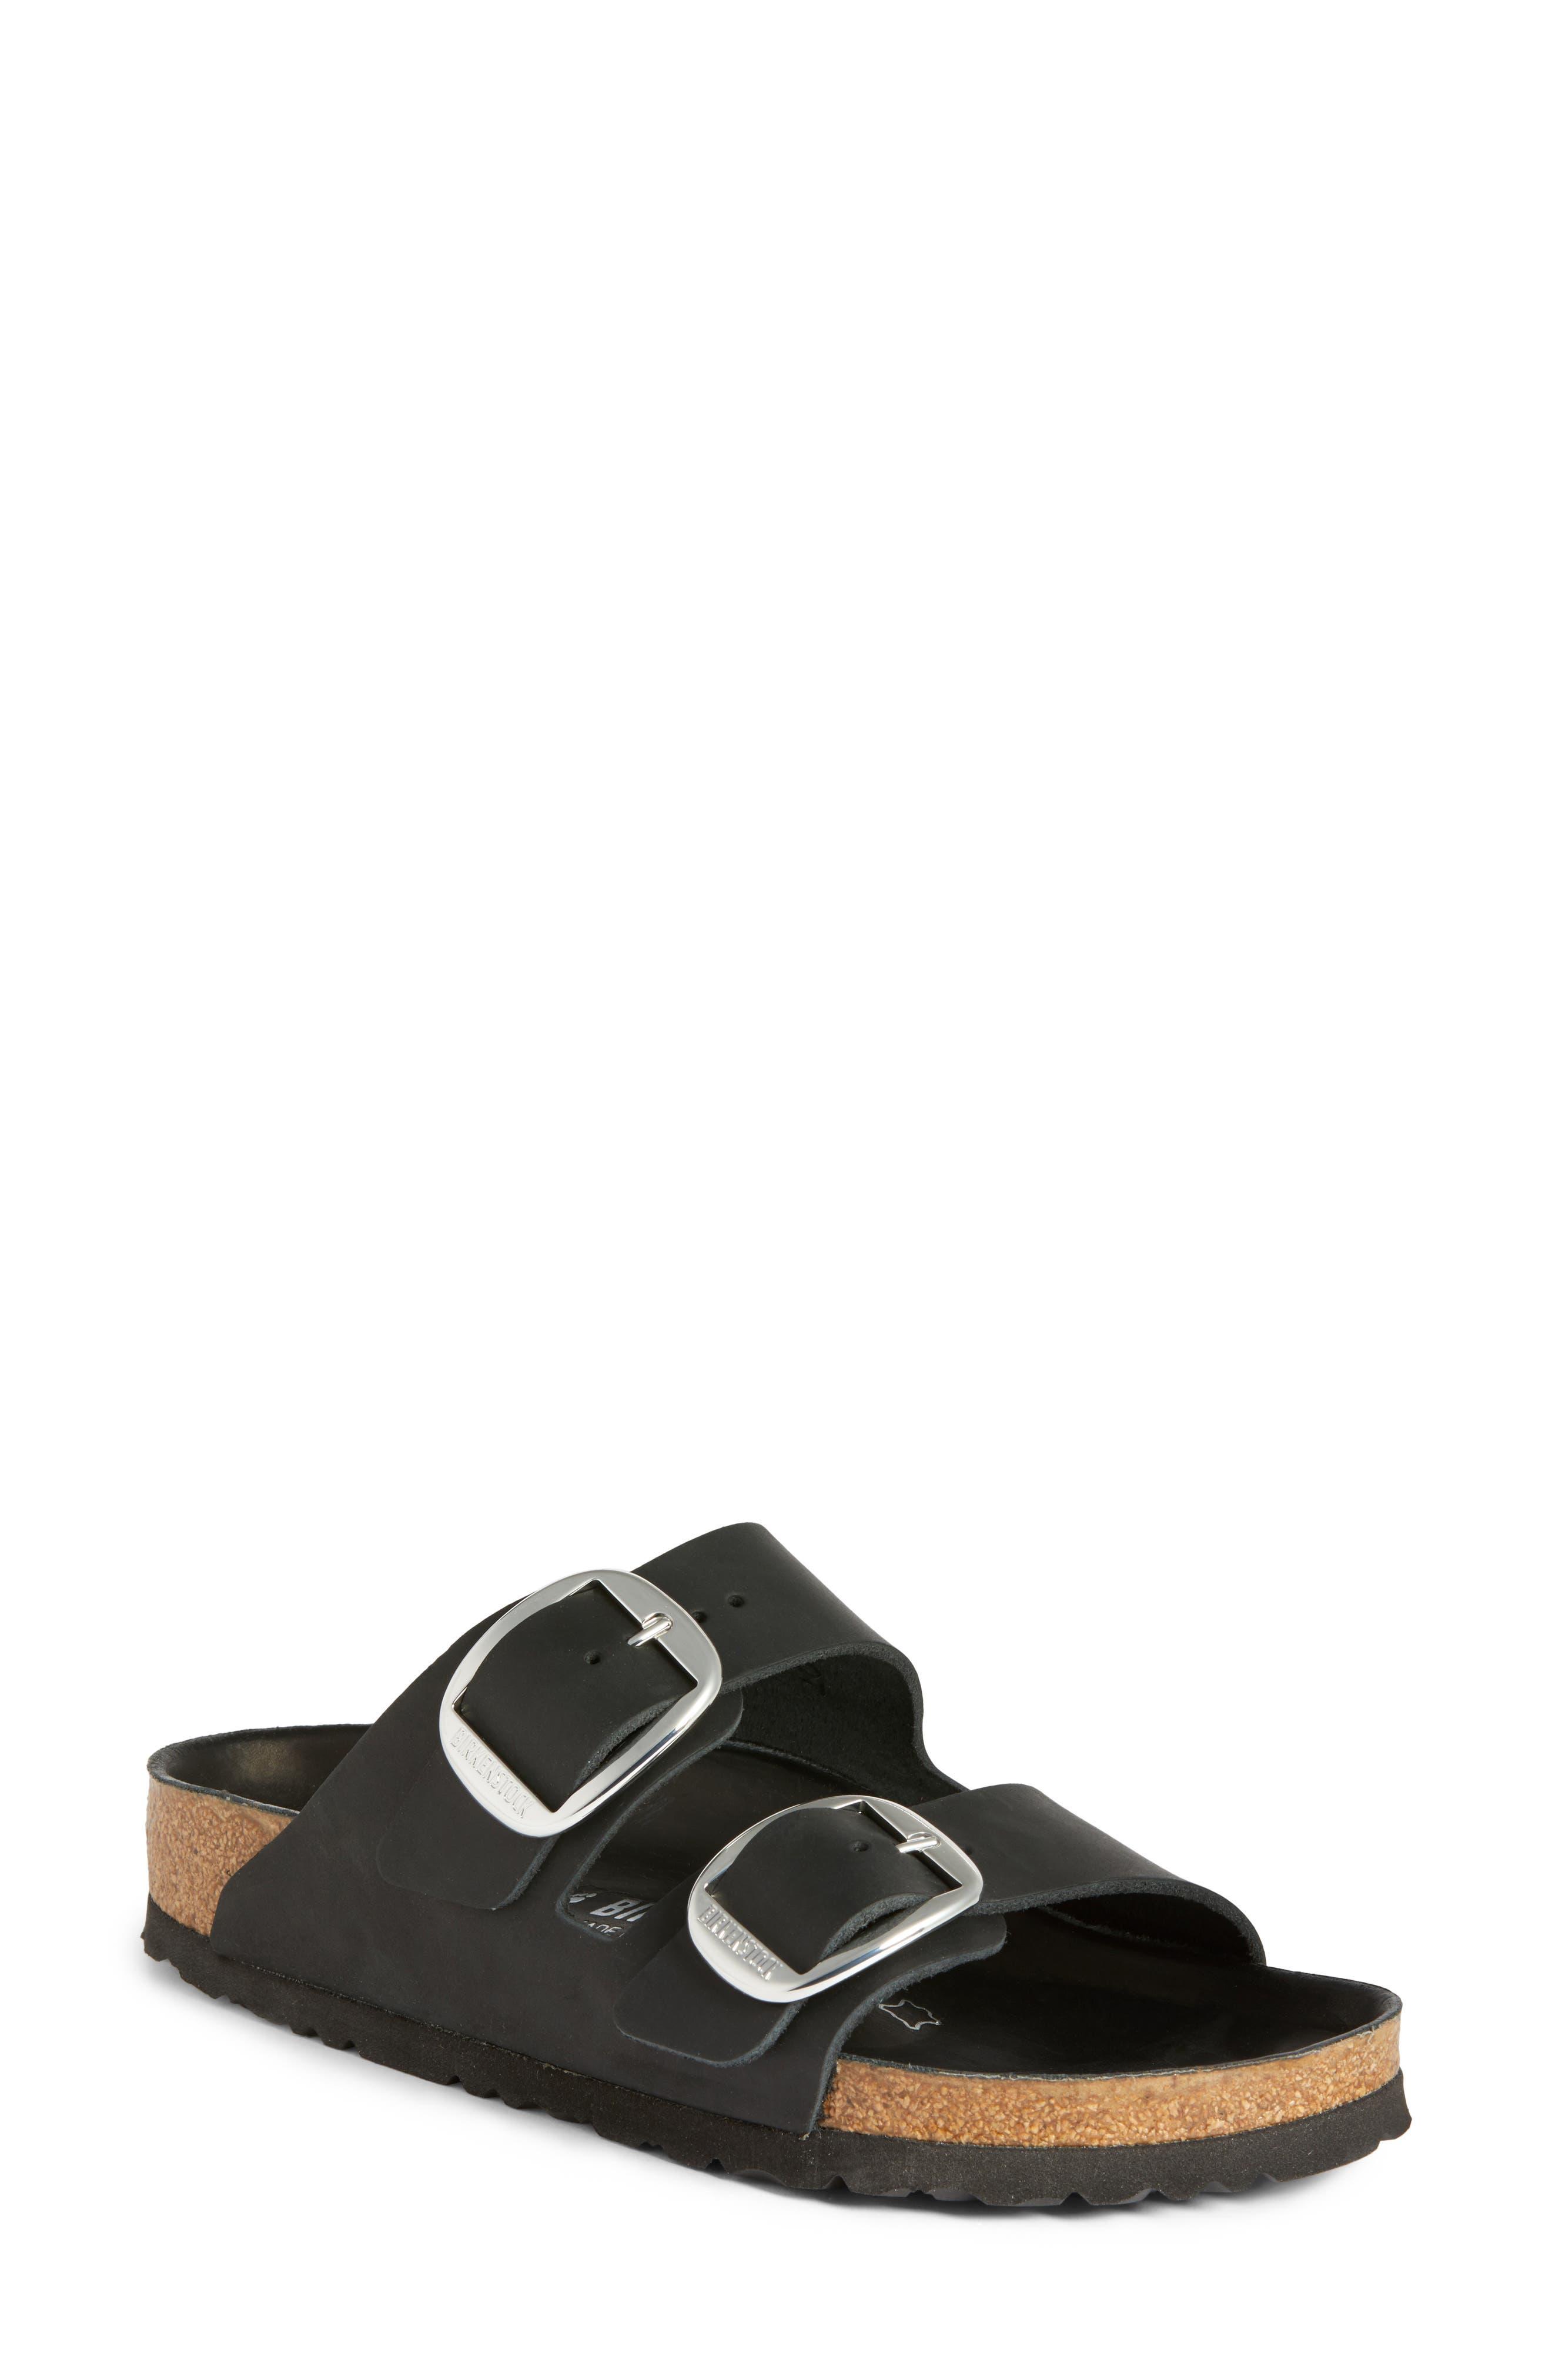 Arizona Big Buckle Slide Sandal,                         Main,                         color, BLACK LEATHER